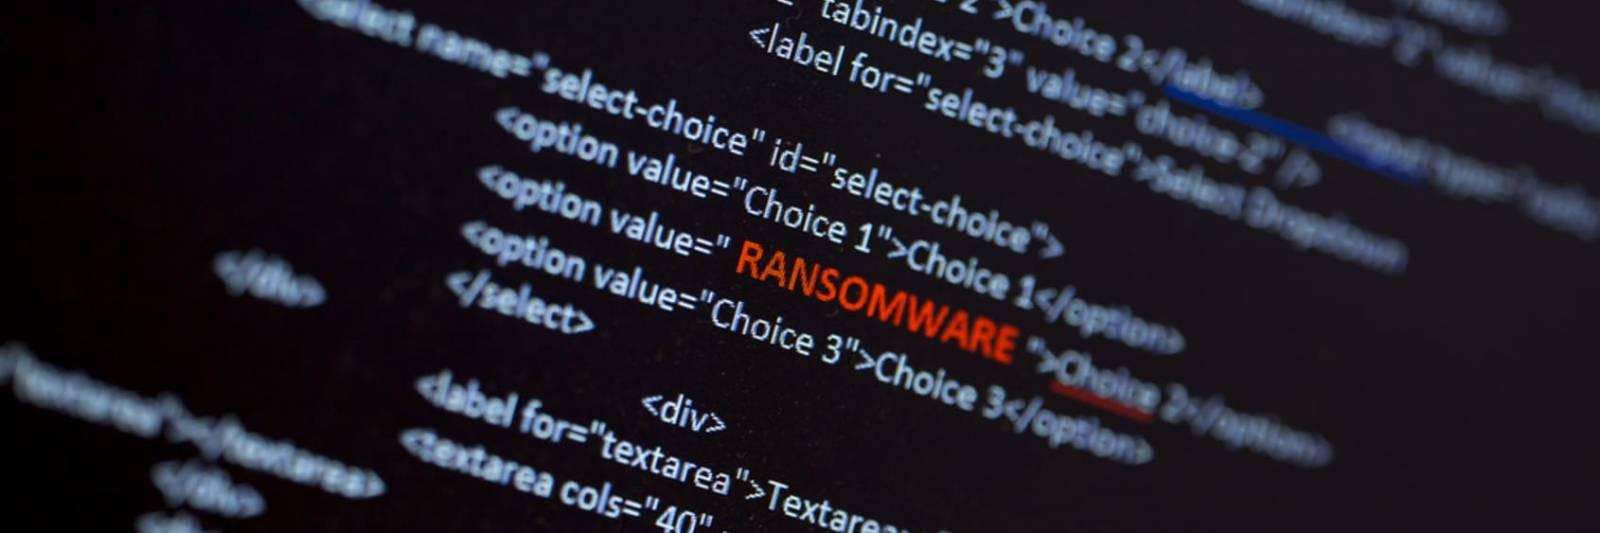 Mountlocker Ransomware Now Working Through Criminal Affiliates